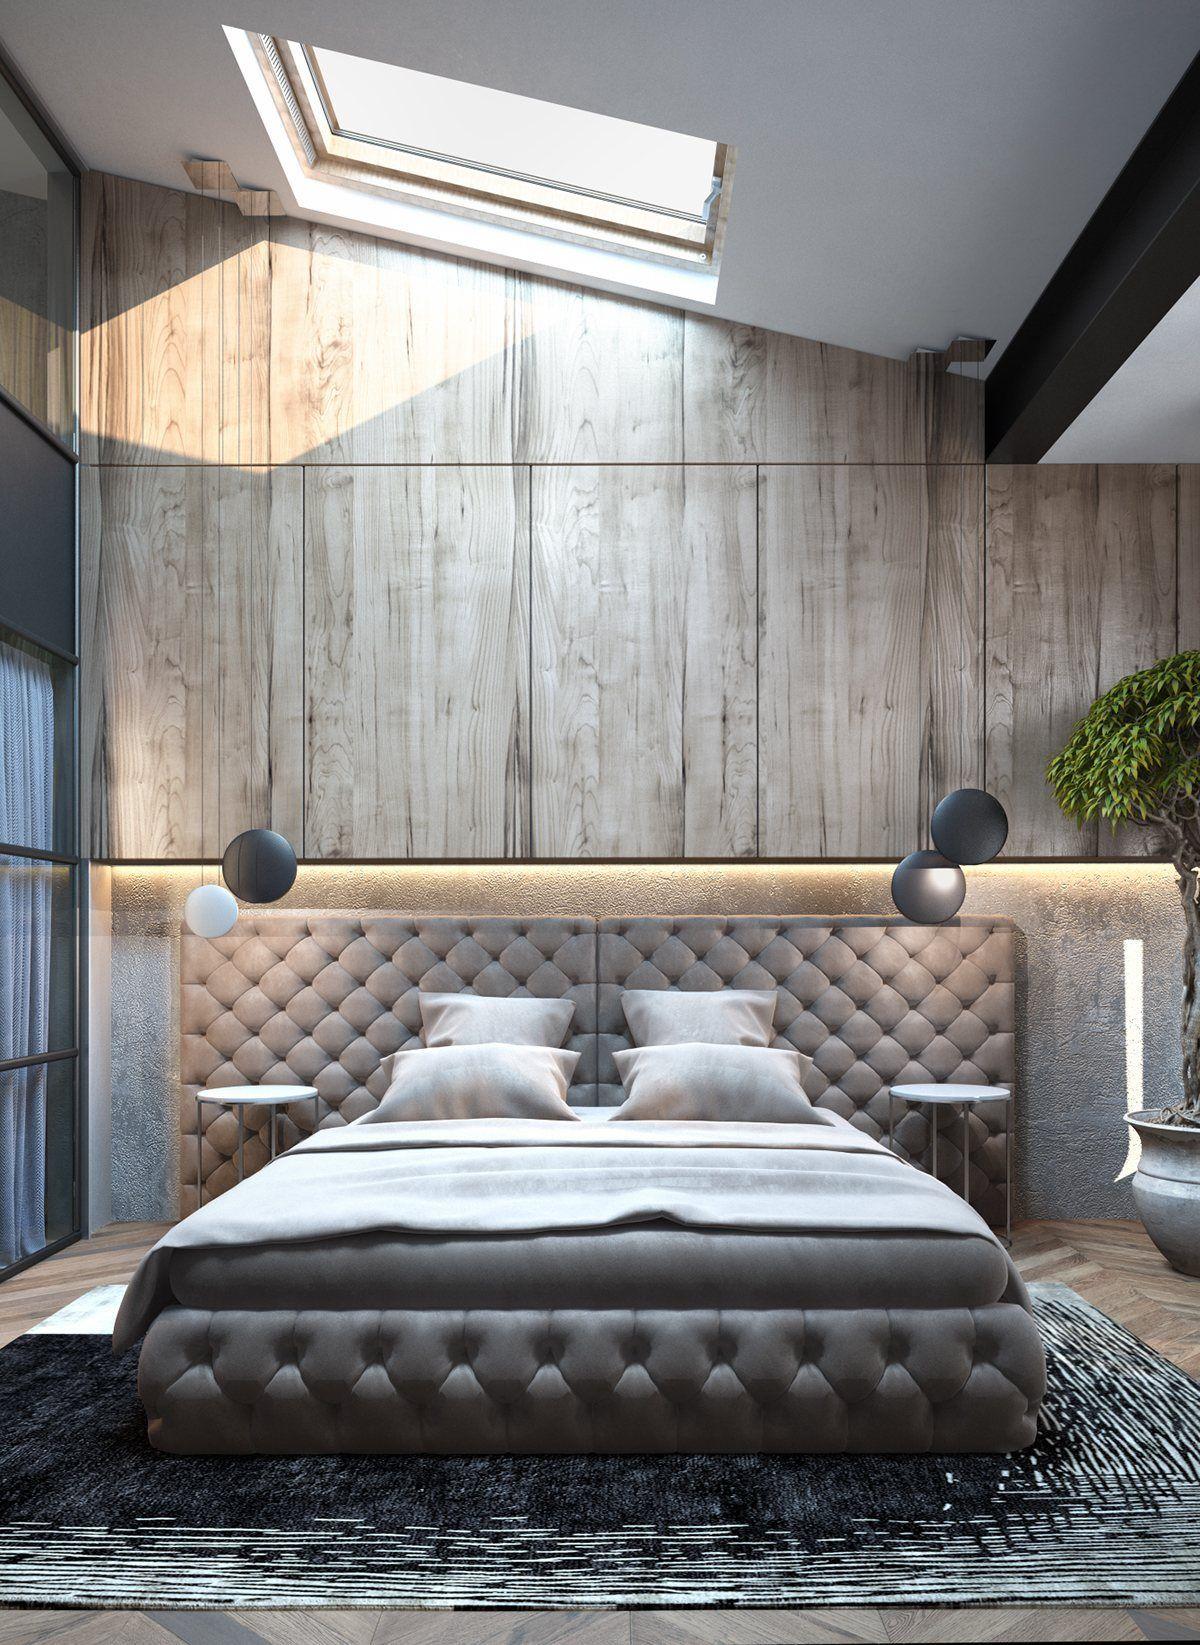 Miss architettura apartment by tanya dorokhina bedroom interior design showroom interior design modern